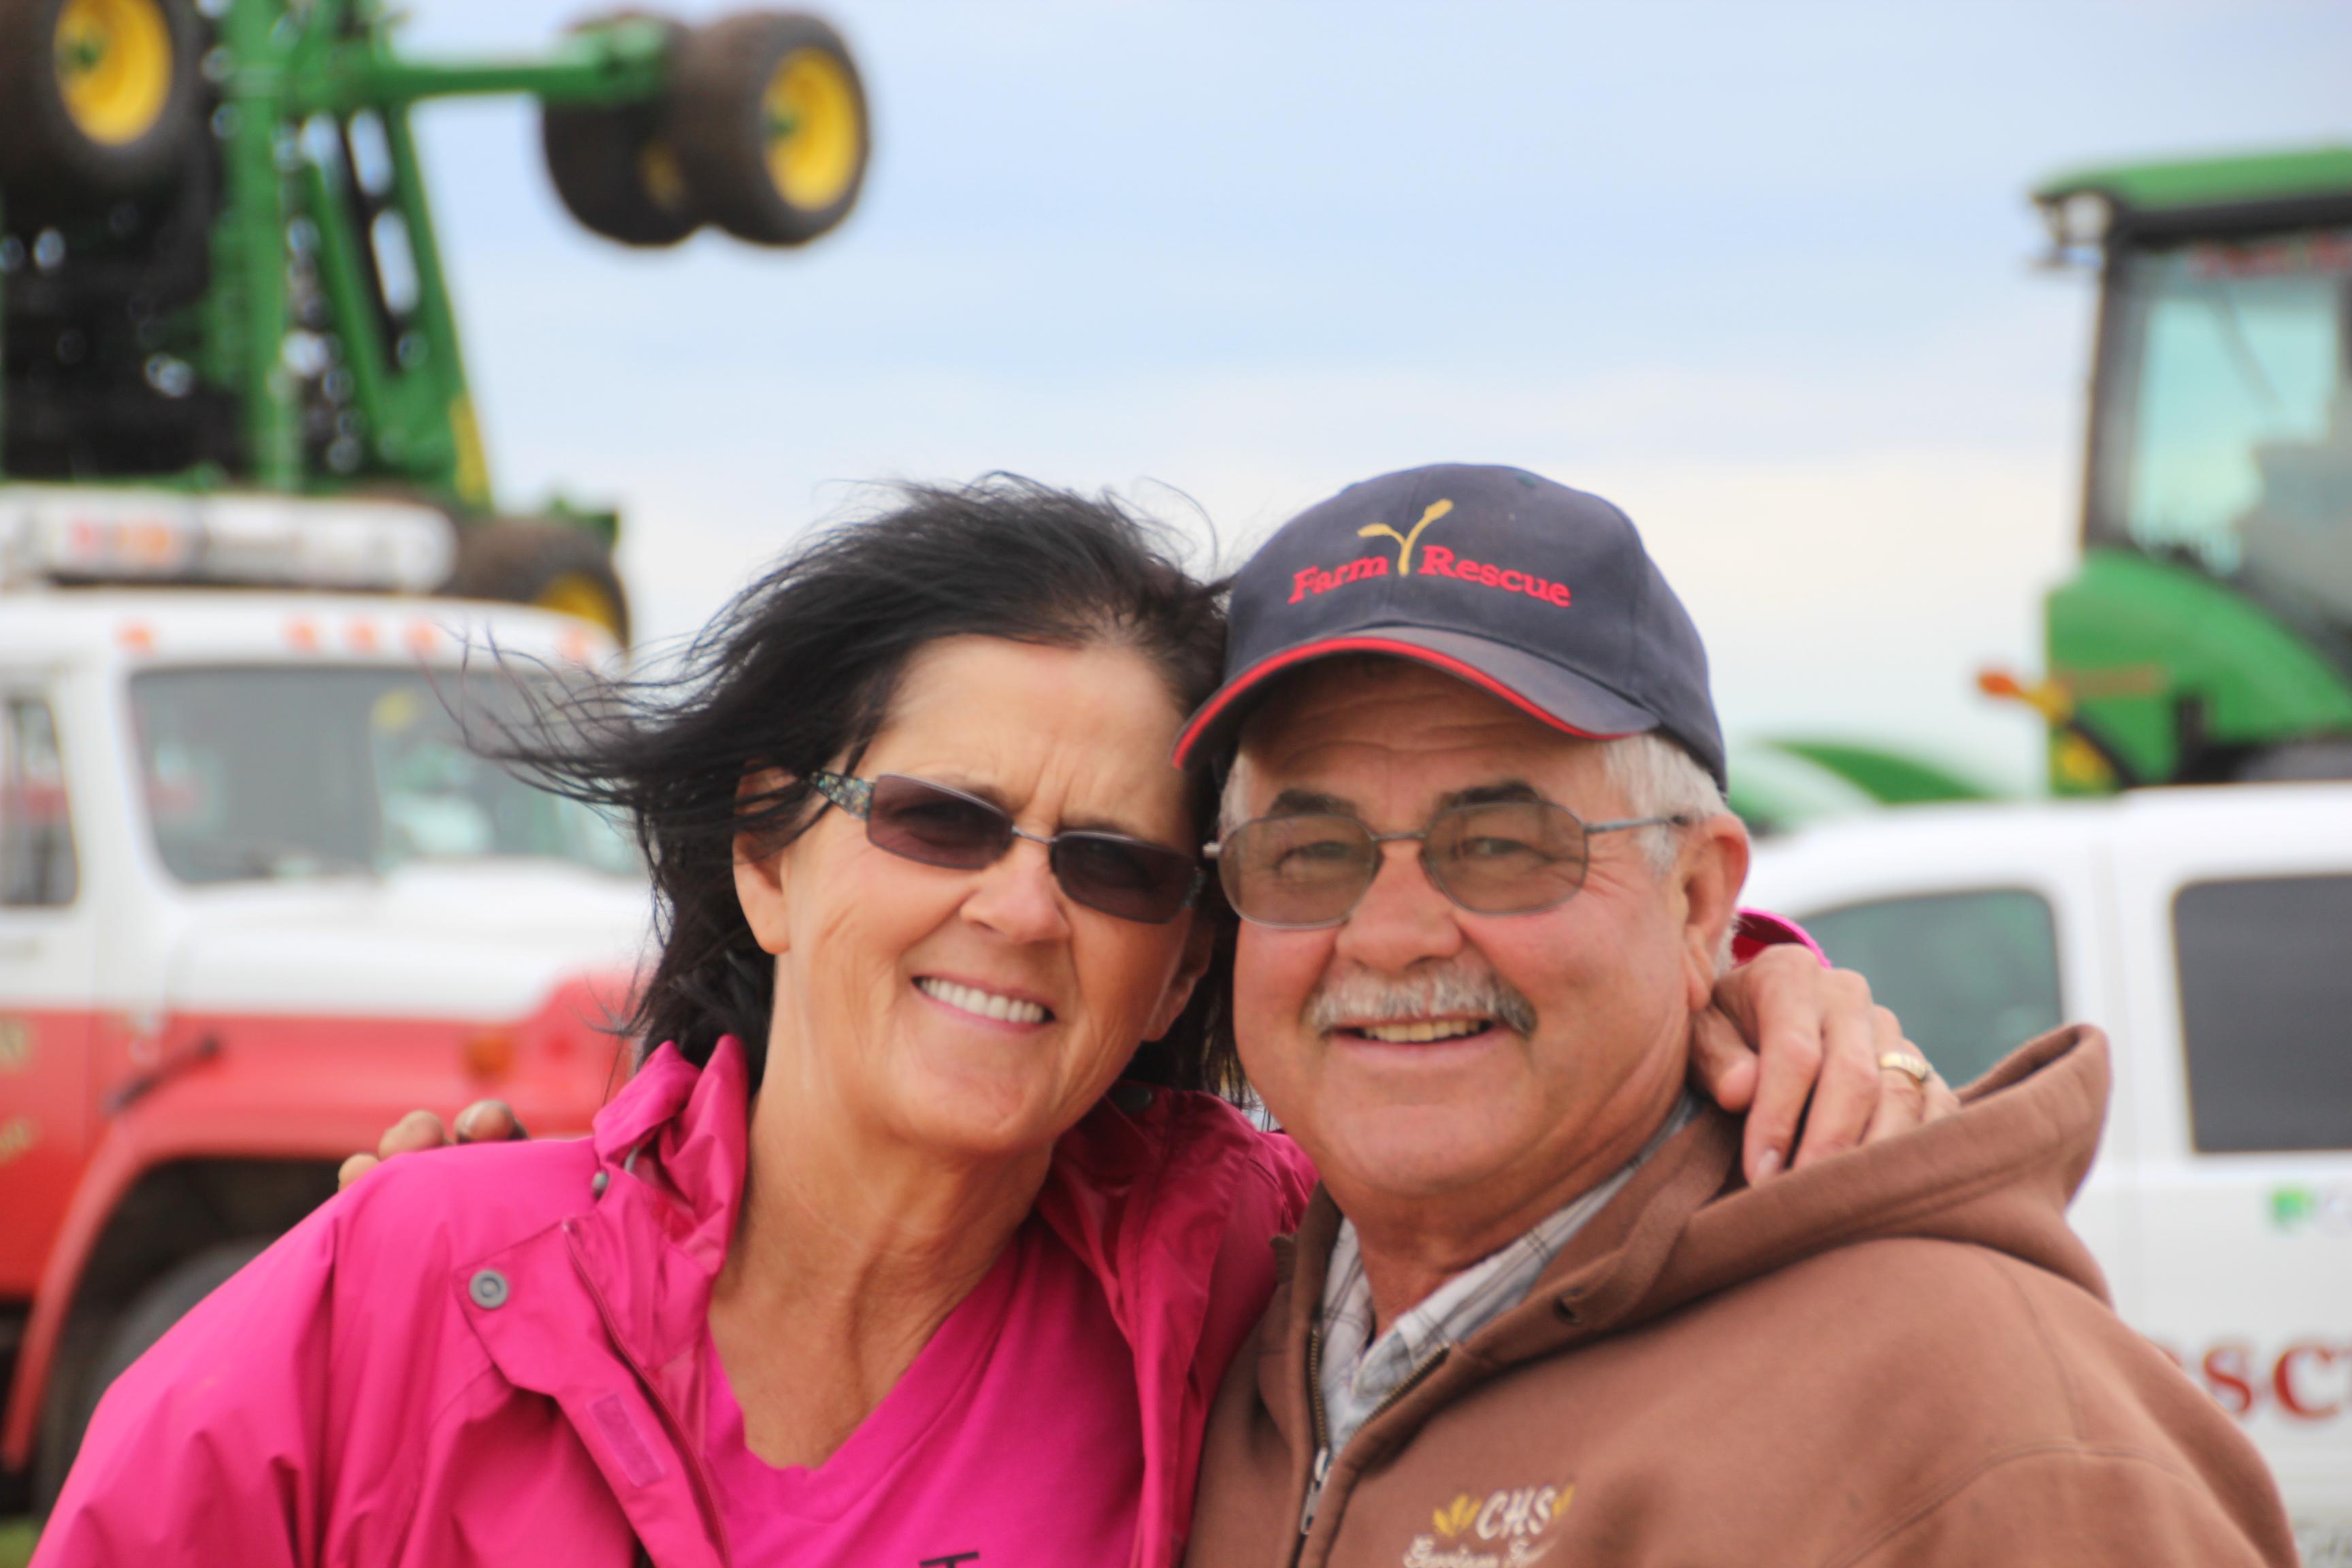 Zack & Marion Roberts